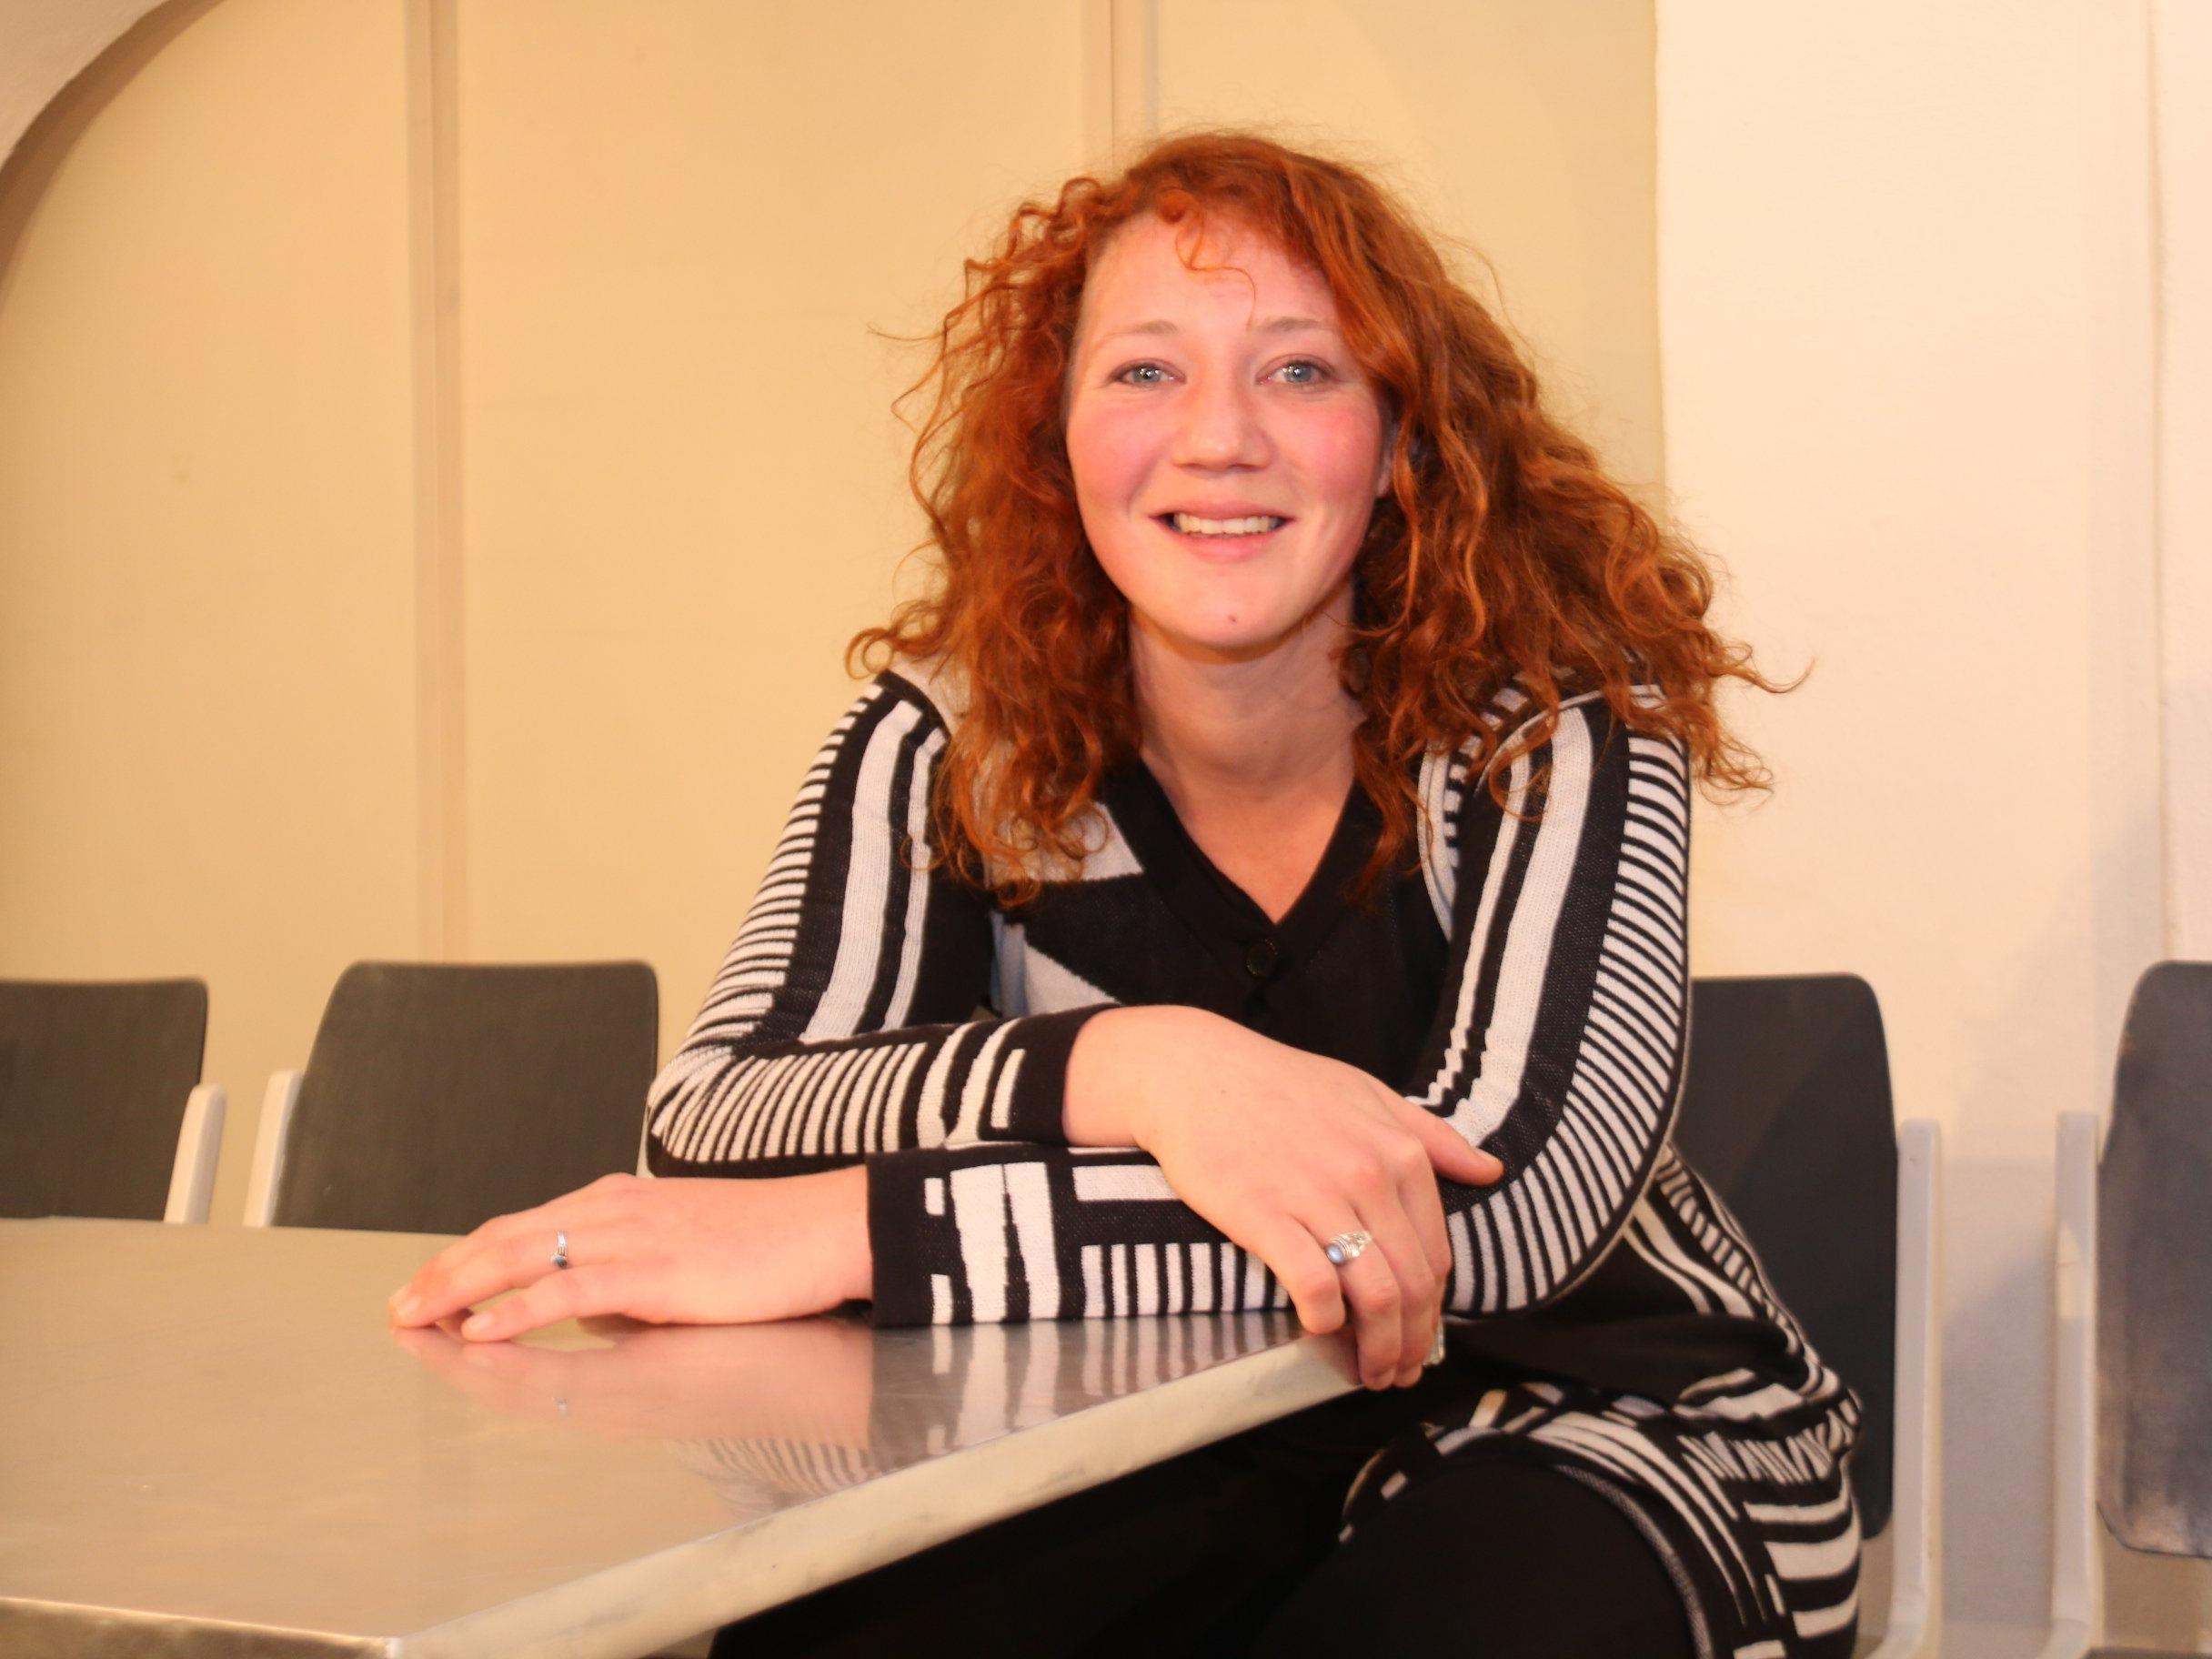 Lisa Suitner im großen Monolog über das diffizile Thema Suizid.